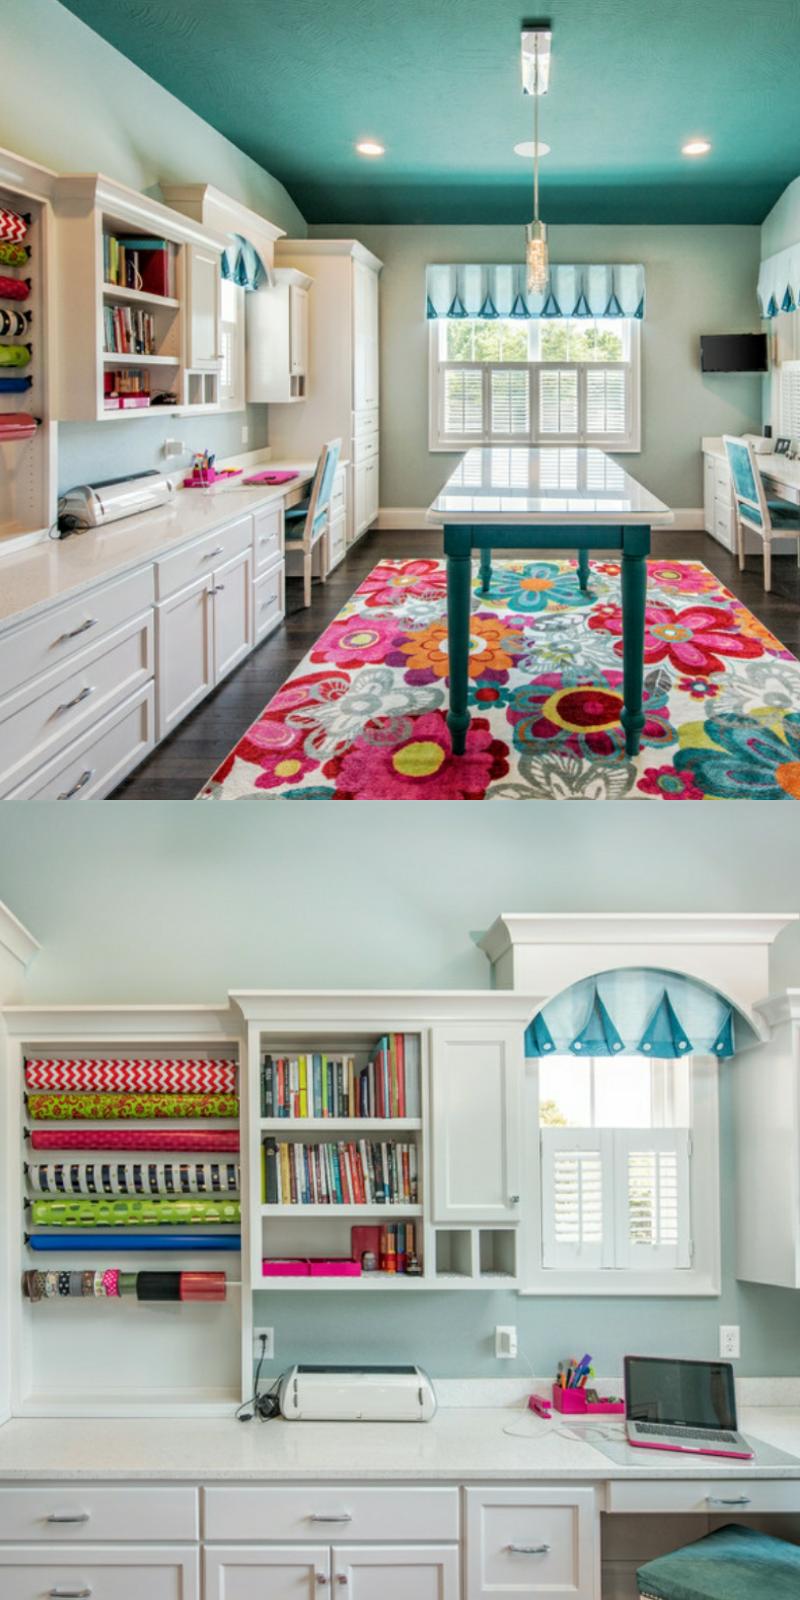 Delightful Craft Room Ideas (Small, Storage, and DIY craft